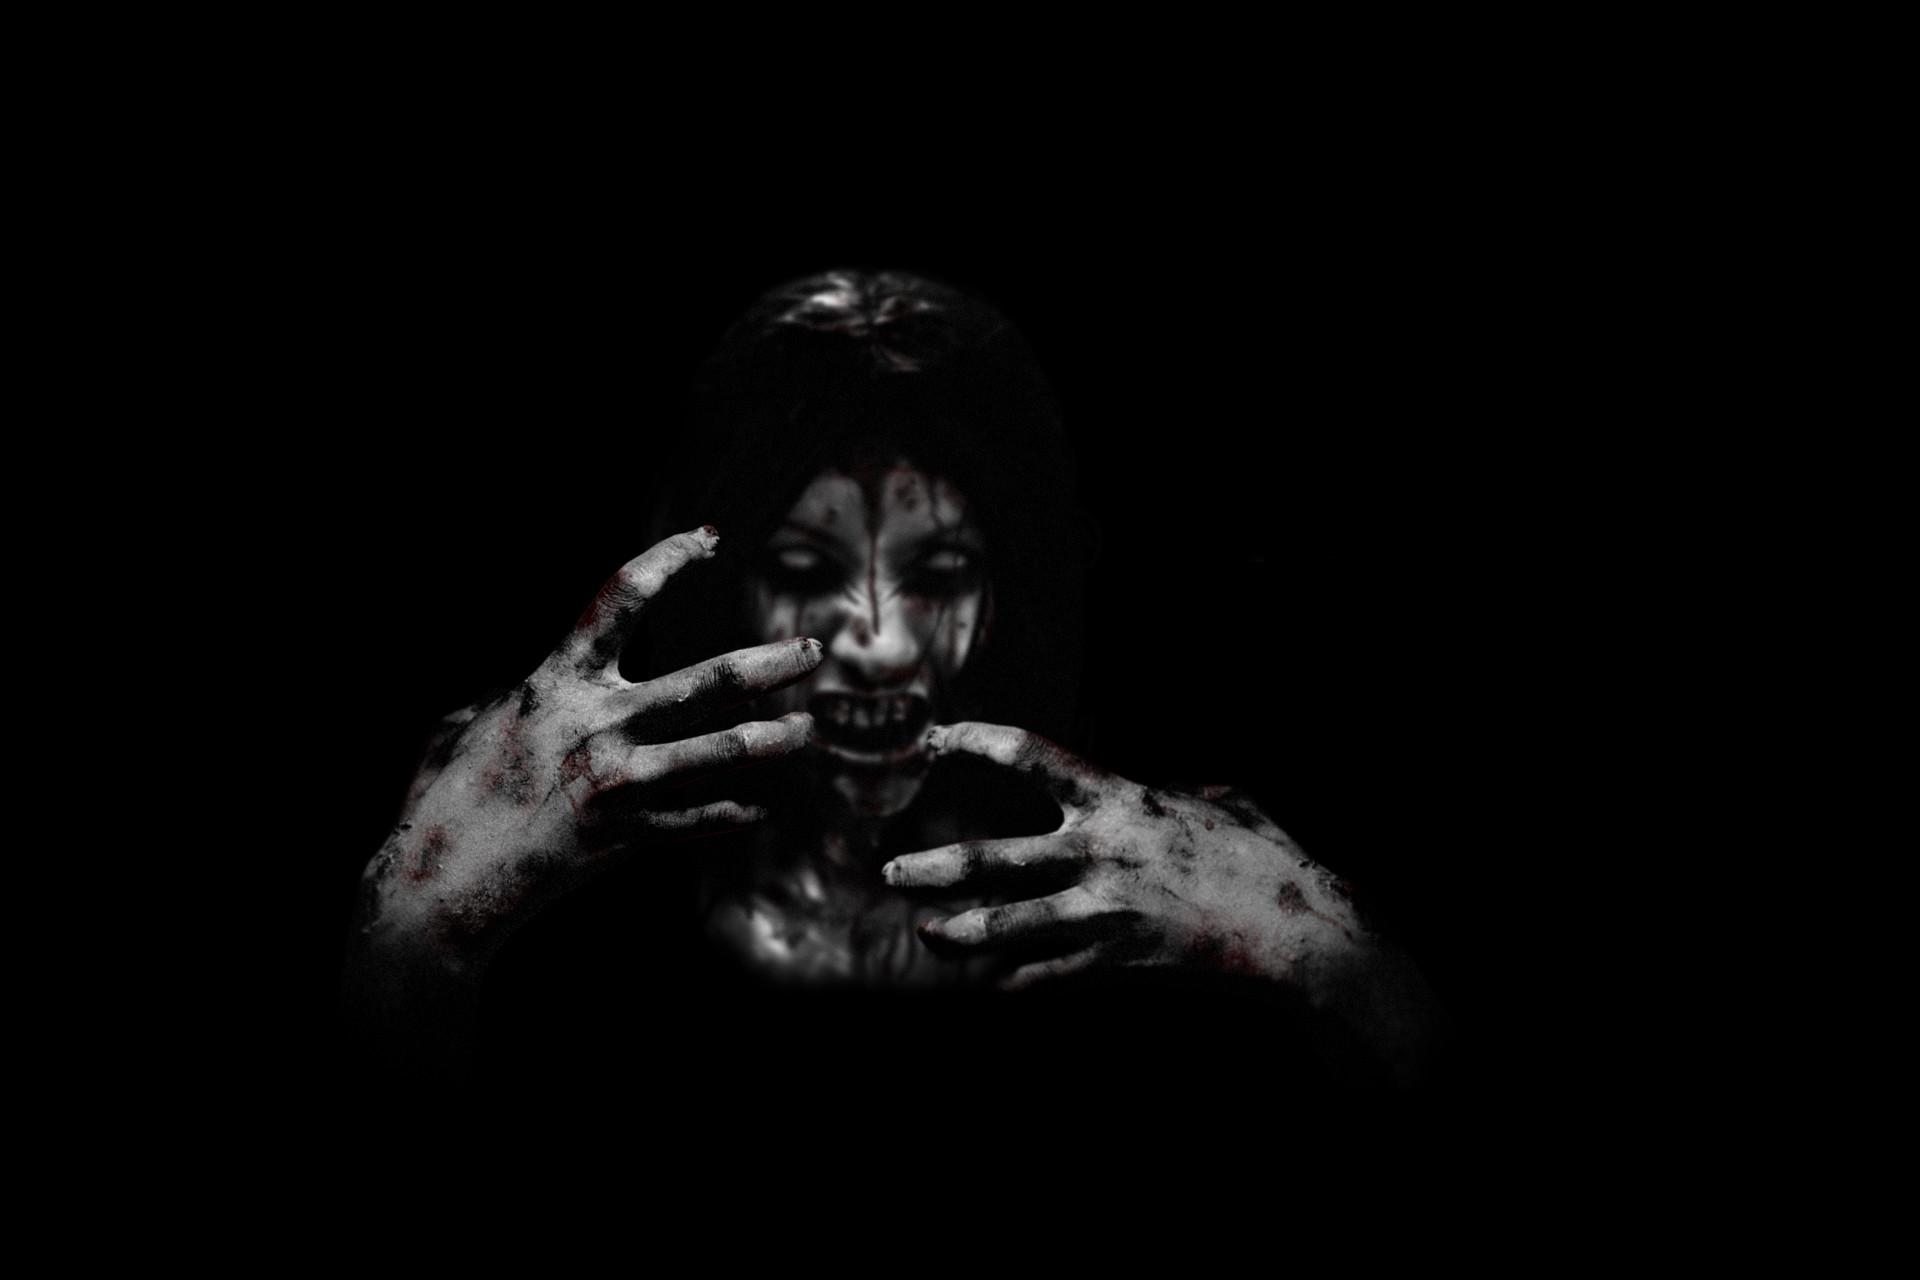 The House Creepy Black Movies Demon Blood Face Dark Horror Evil Monster  Wallpaper At Dark Wallpapers